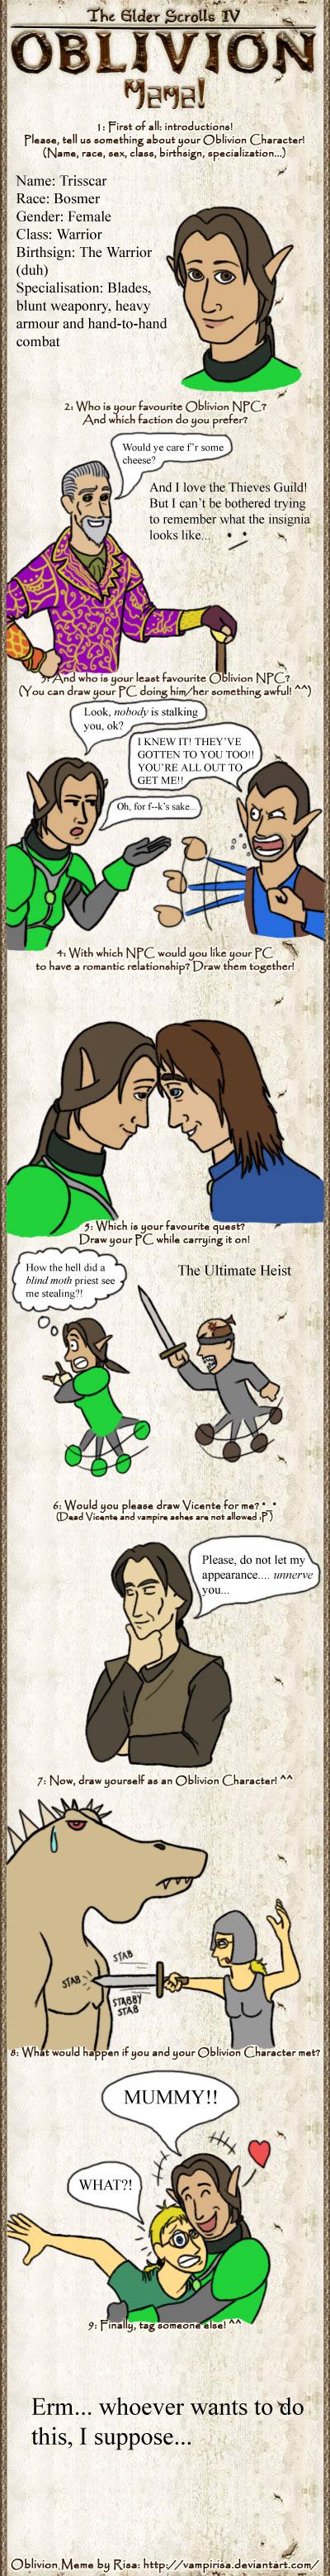 Oblivion Meme by Kordyne